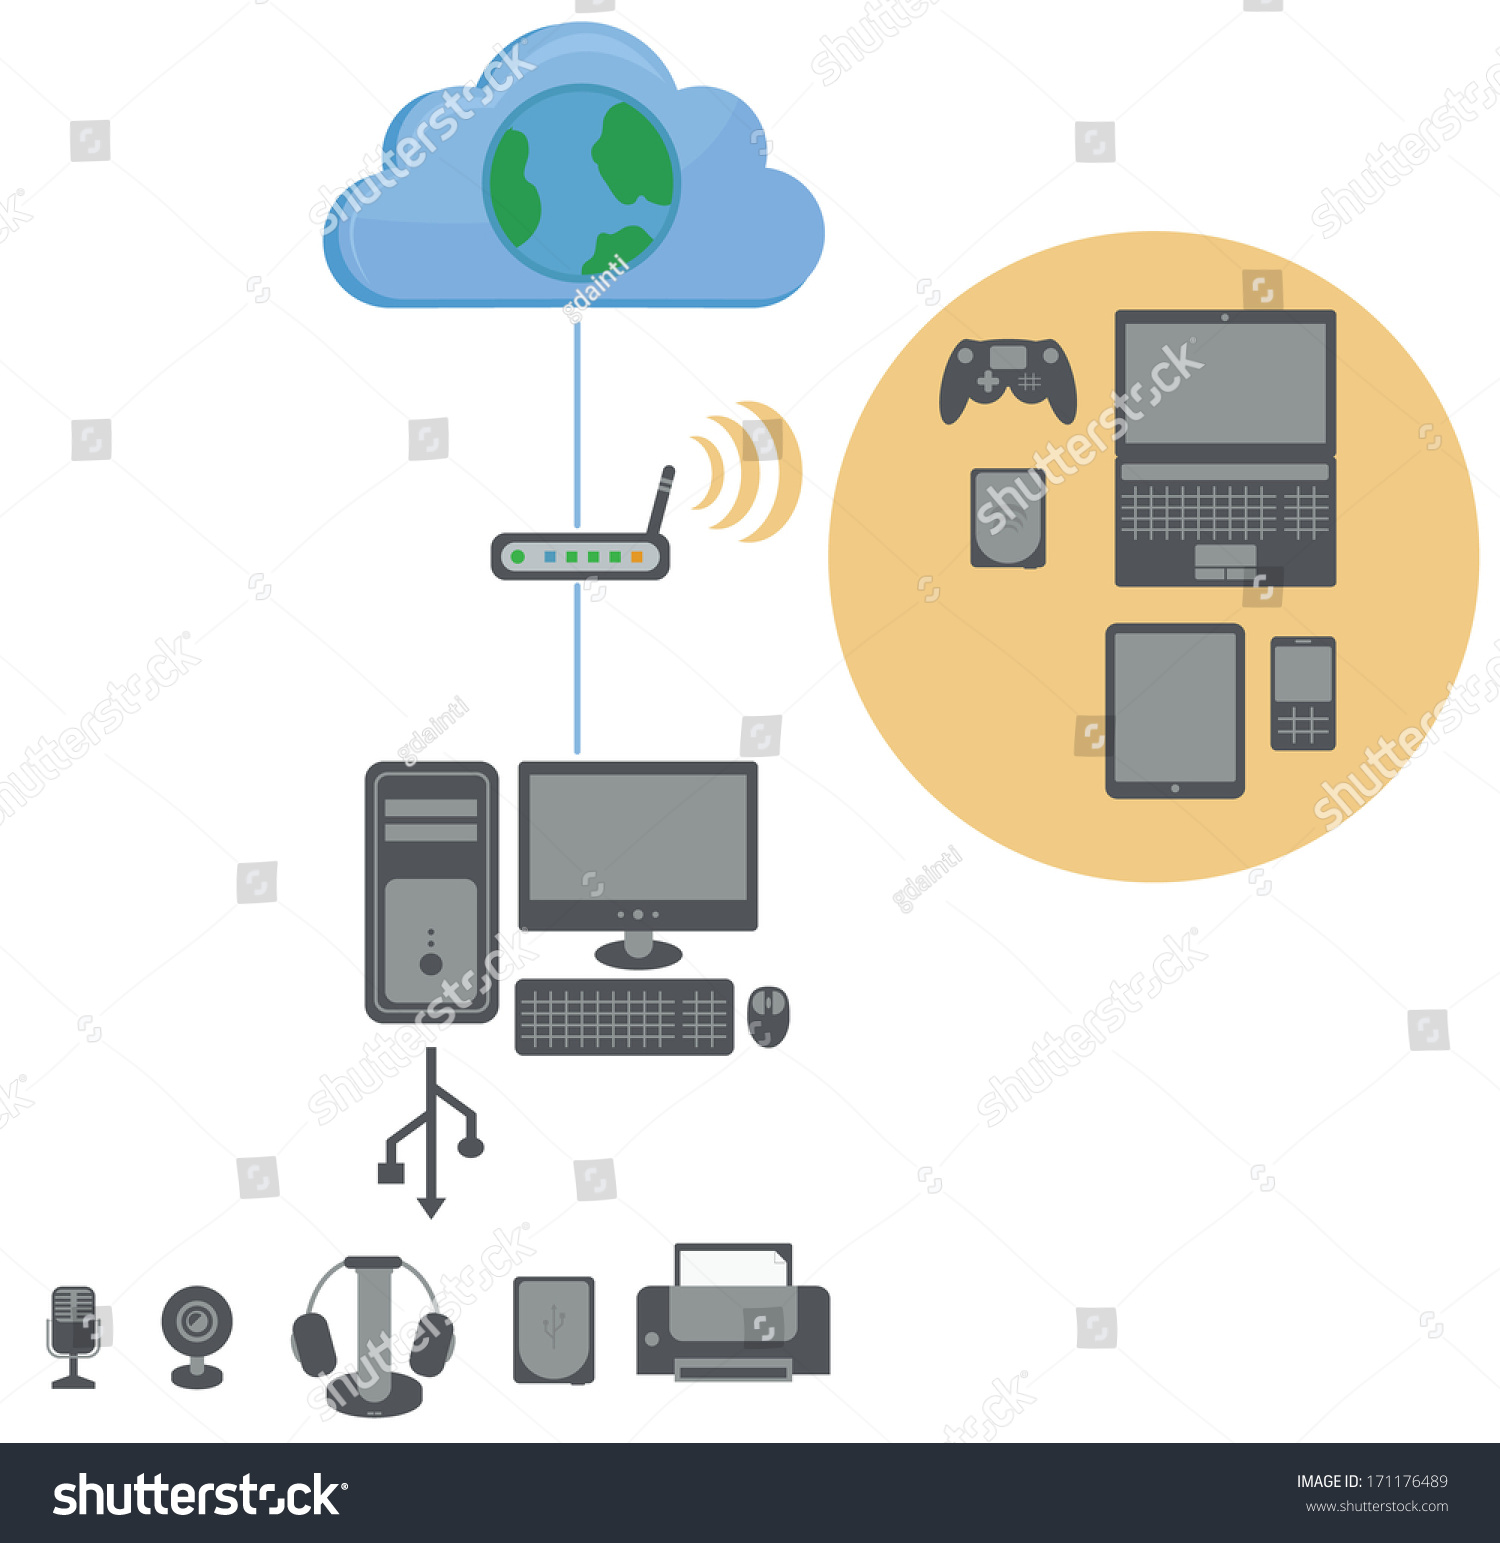 hight resolution of verizon fios phone wiring diagram verizon moca wiring